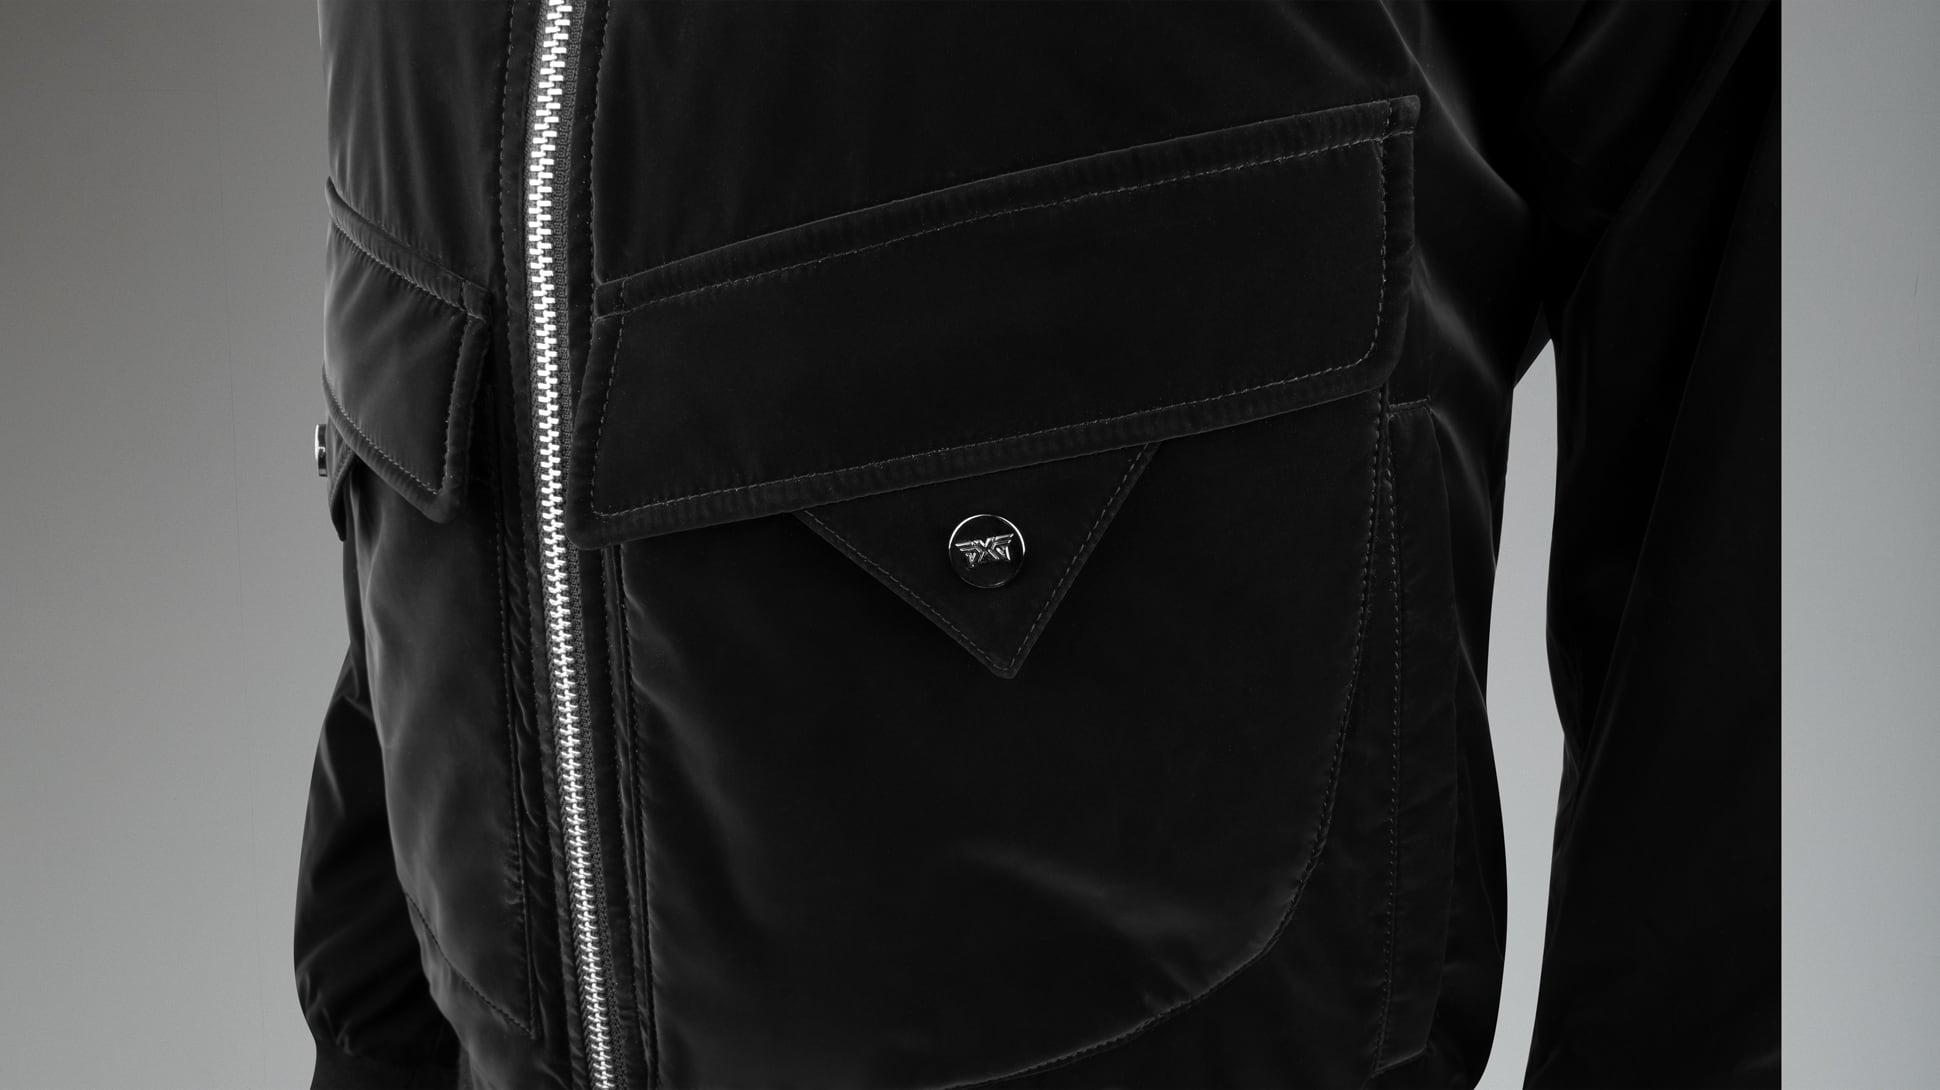 Winter-Ready Wool Bomber Jacket Image 5